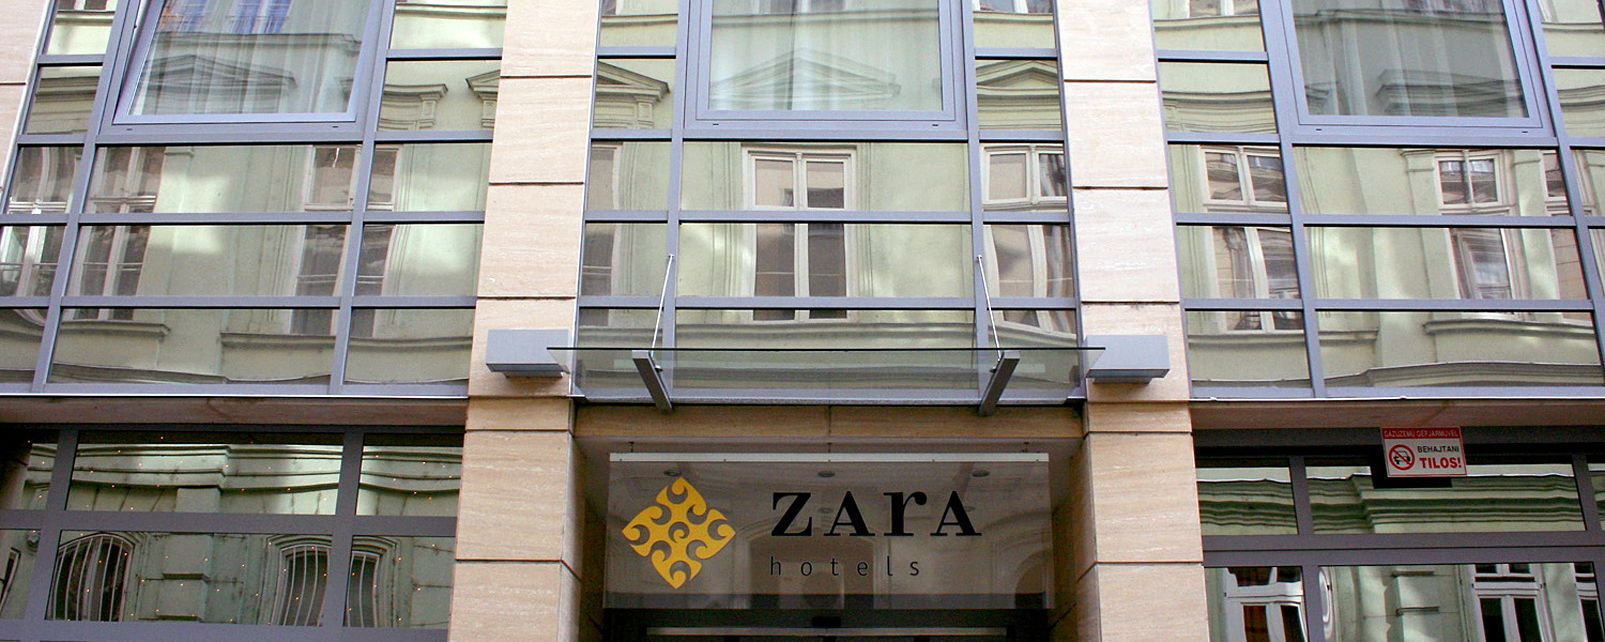 Hotel Zara Boutique Hotel